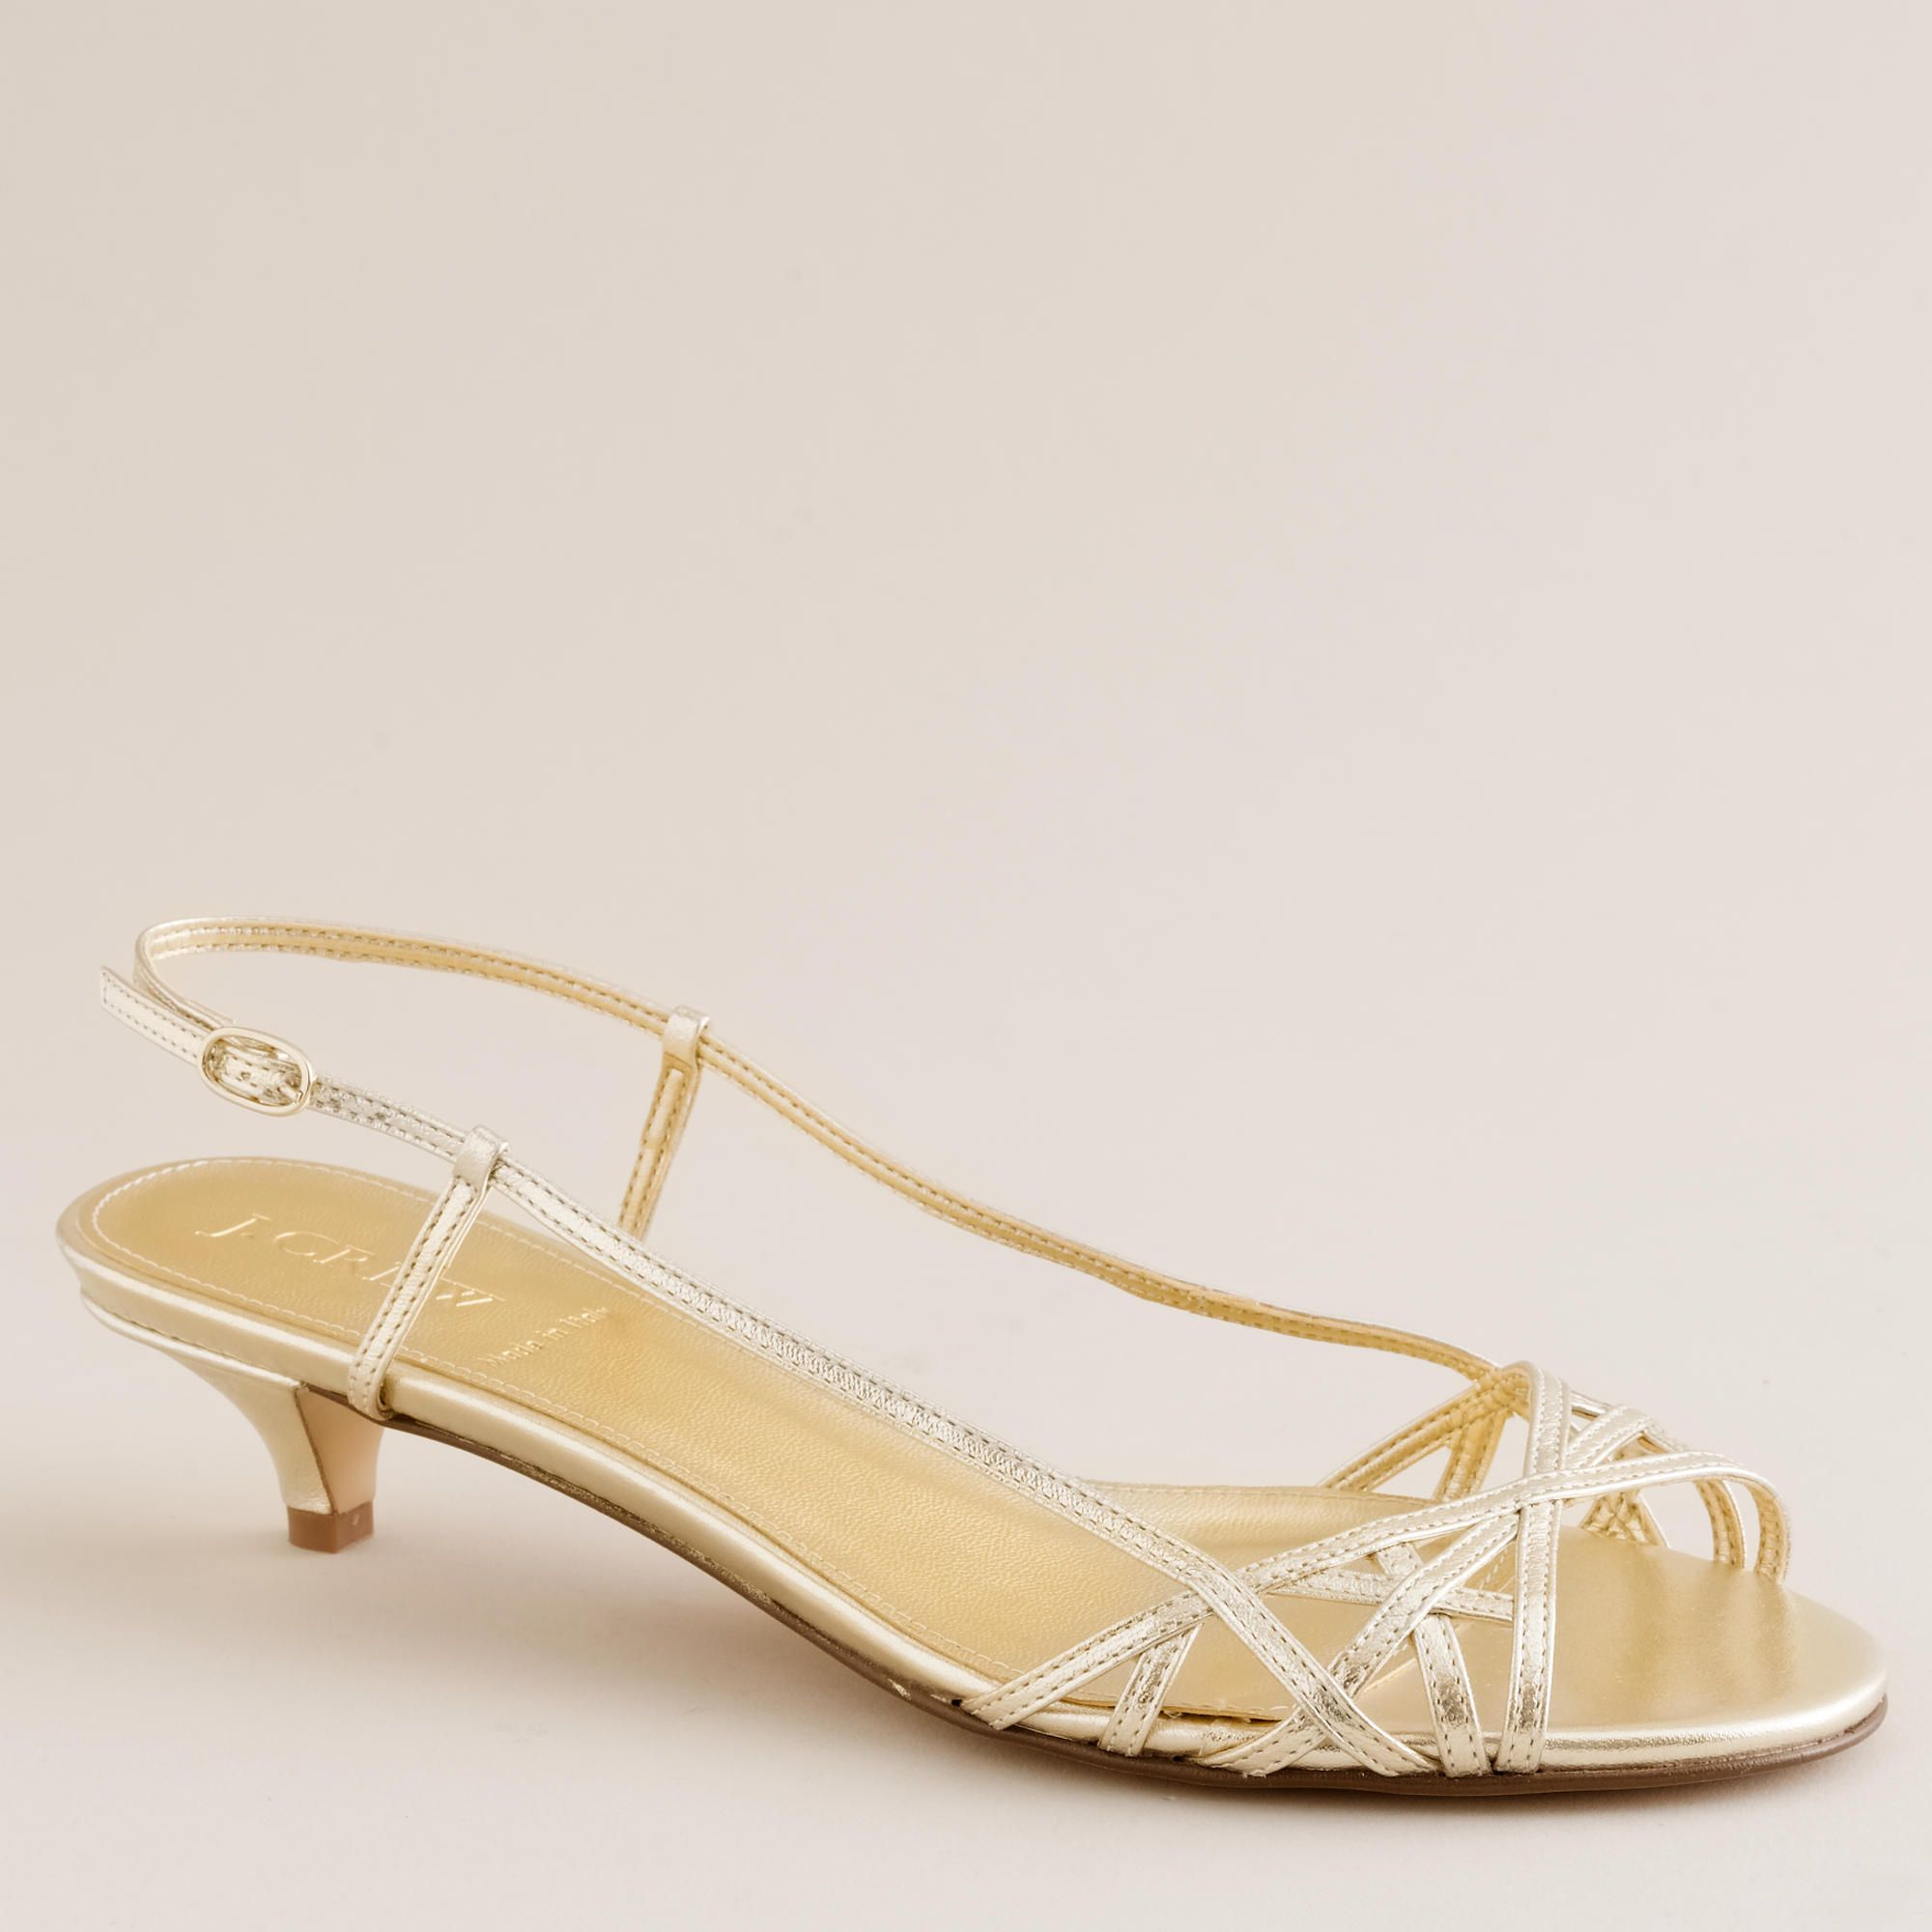 Jillian Strappy Kitten Heels Bridesmaid Shoes Low Heel Shoes Wedding Shoes Low Heel